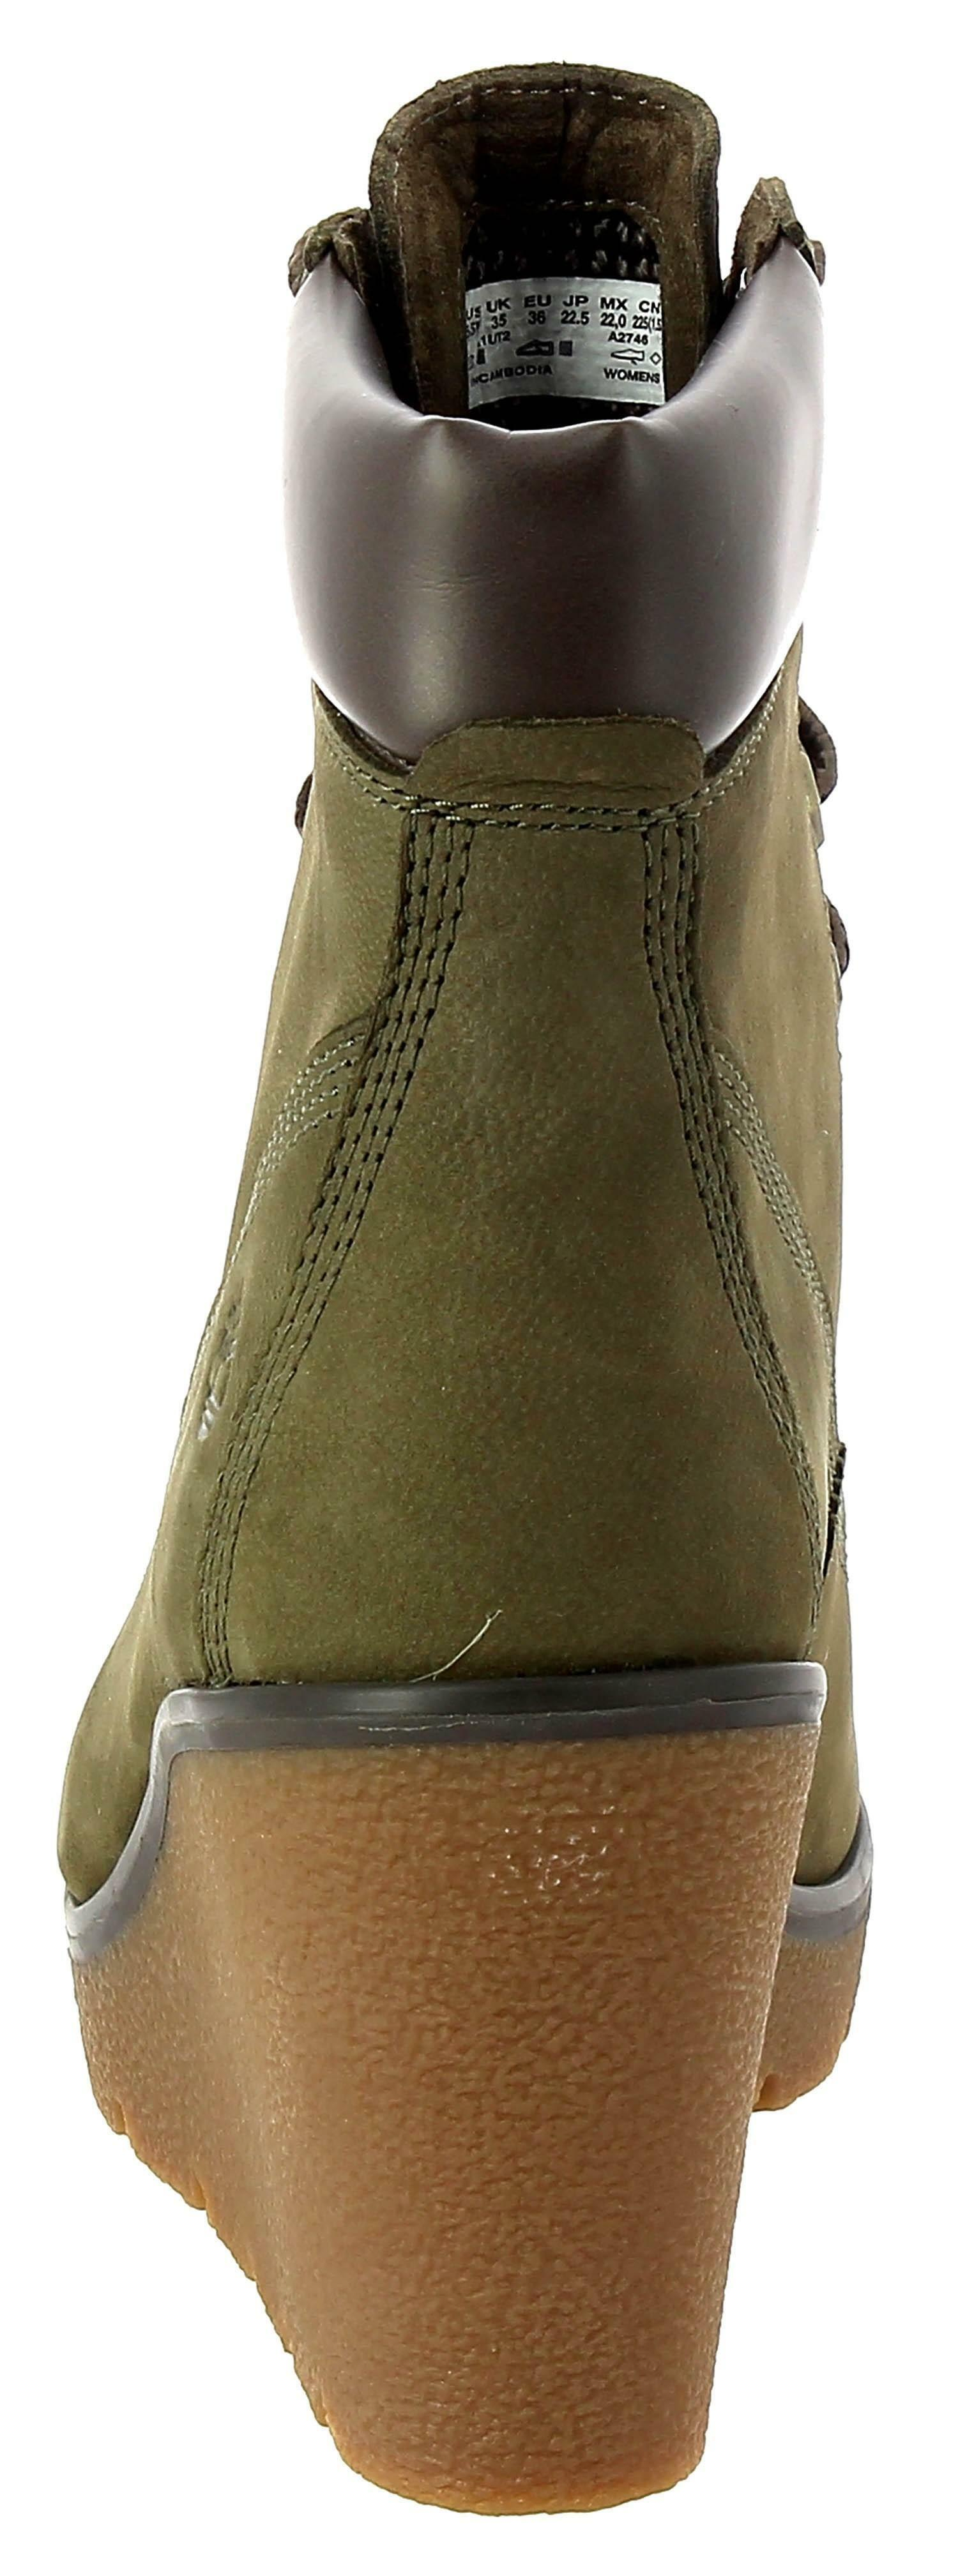 timberland timberland paris height scarpe donna zeppa verdi 0a1ut2